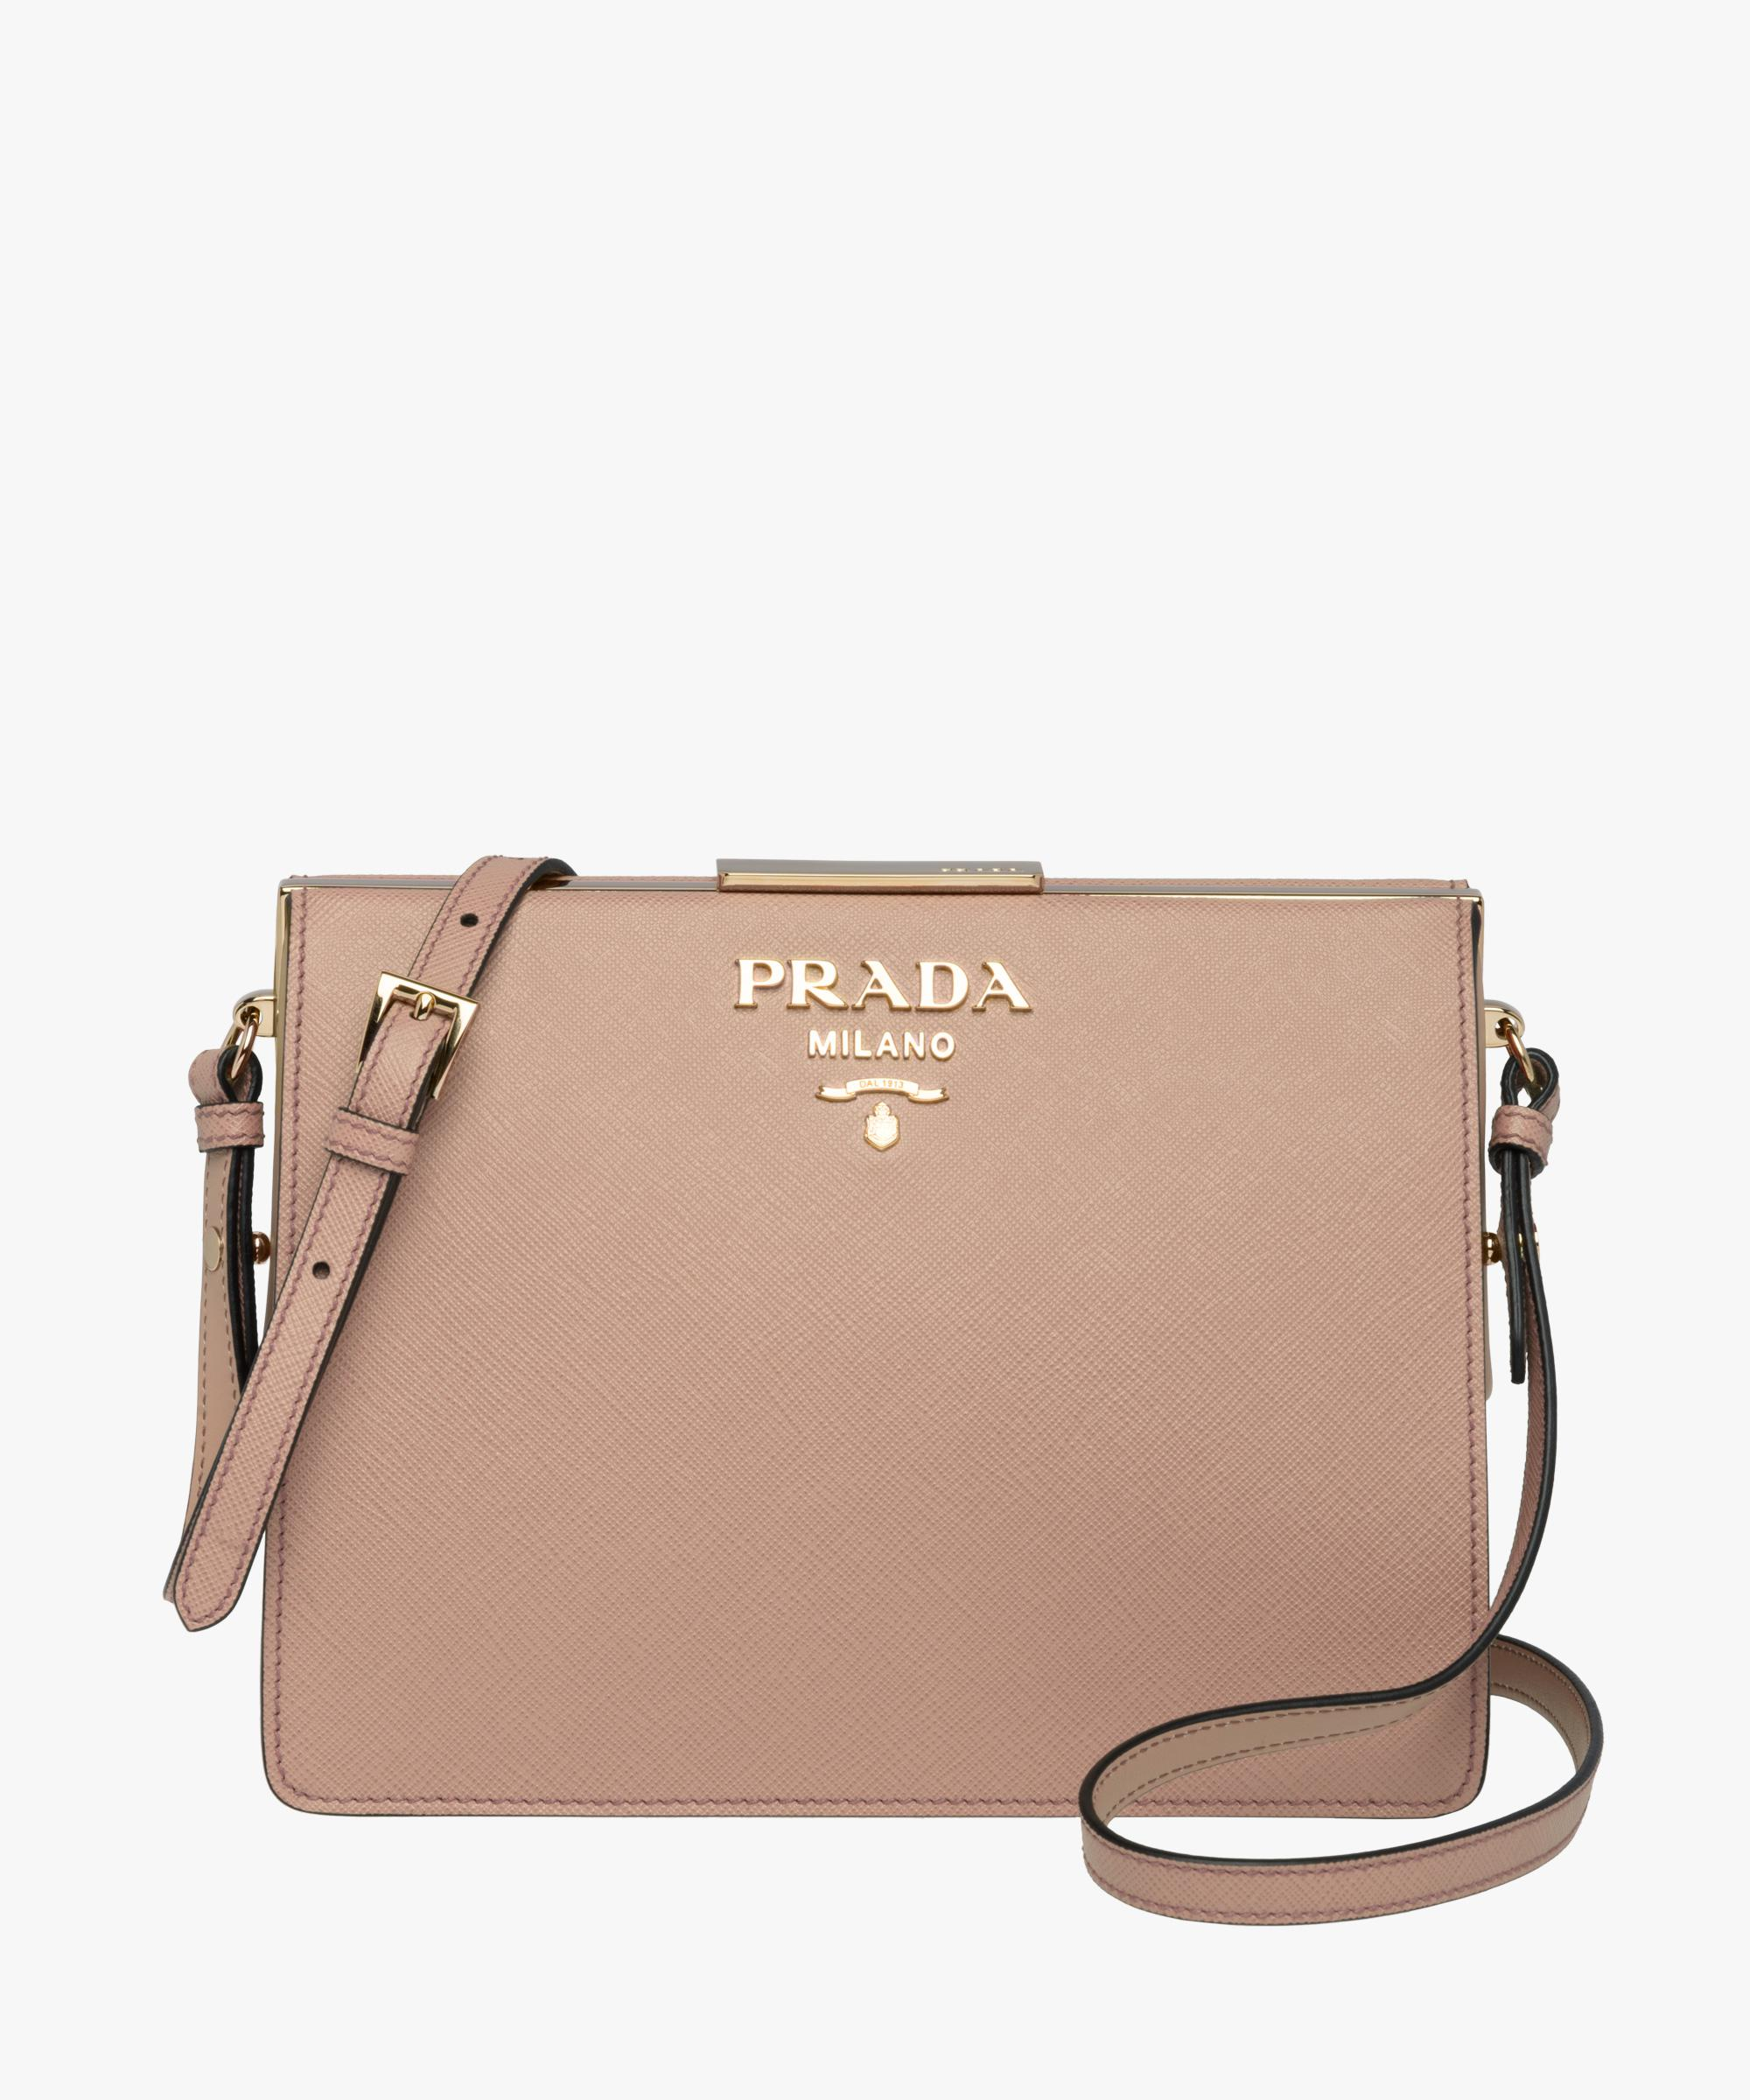 6461d989b29e Lyst - Prada Light Frame Saffiano Leather Bag in Natural